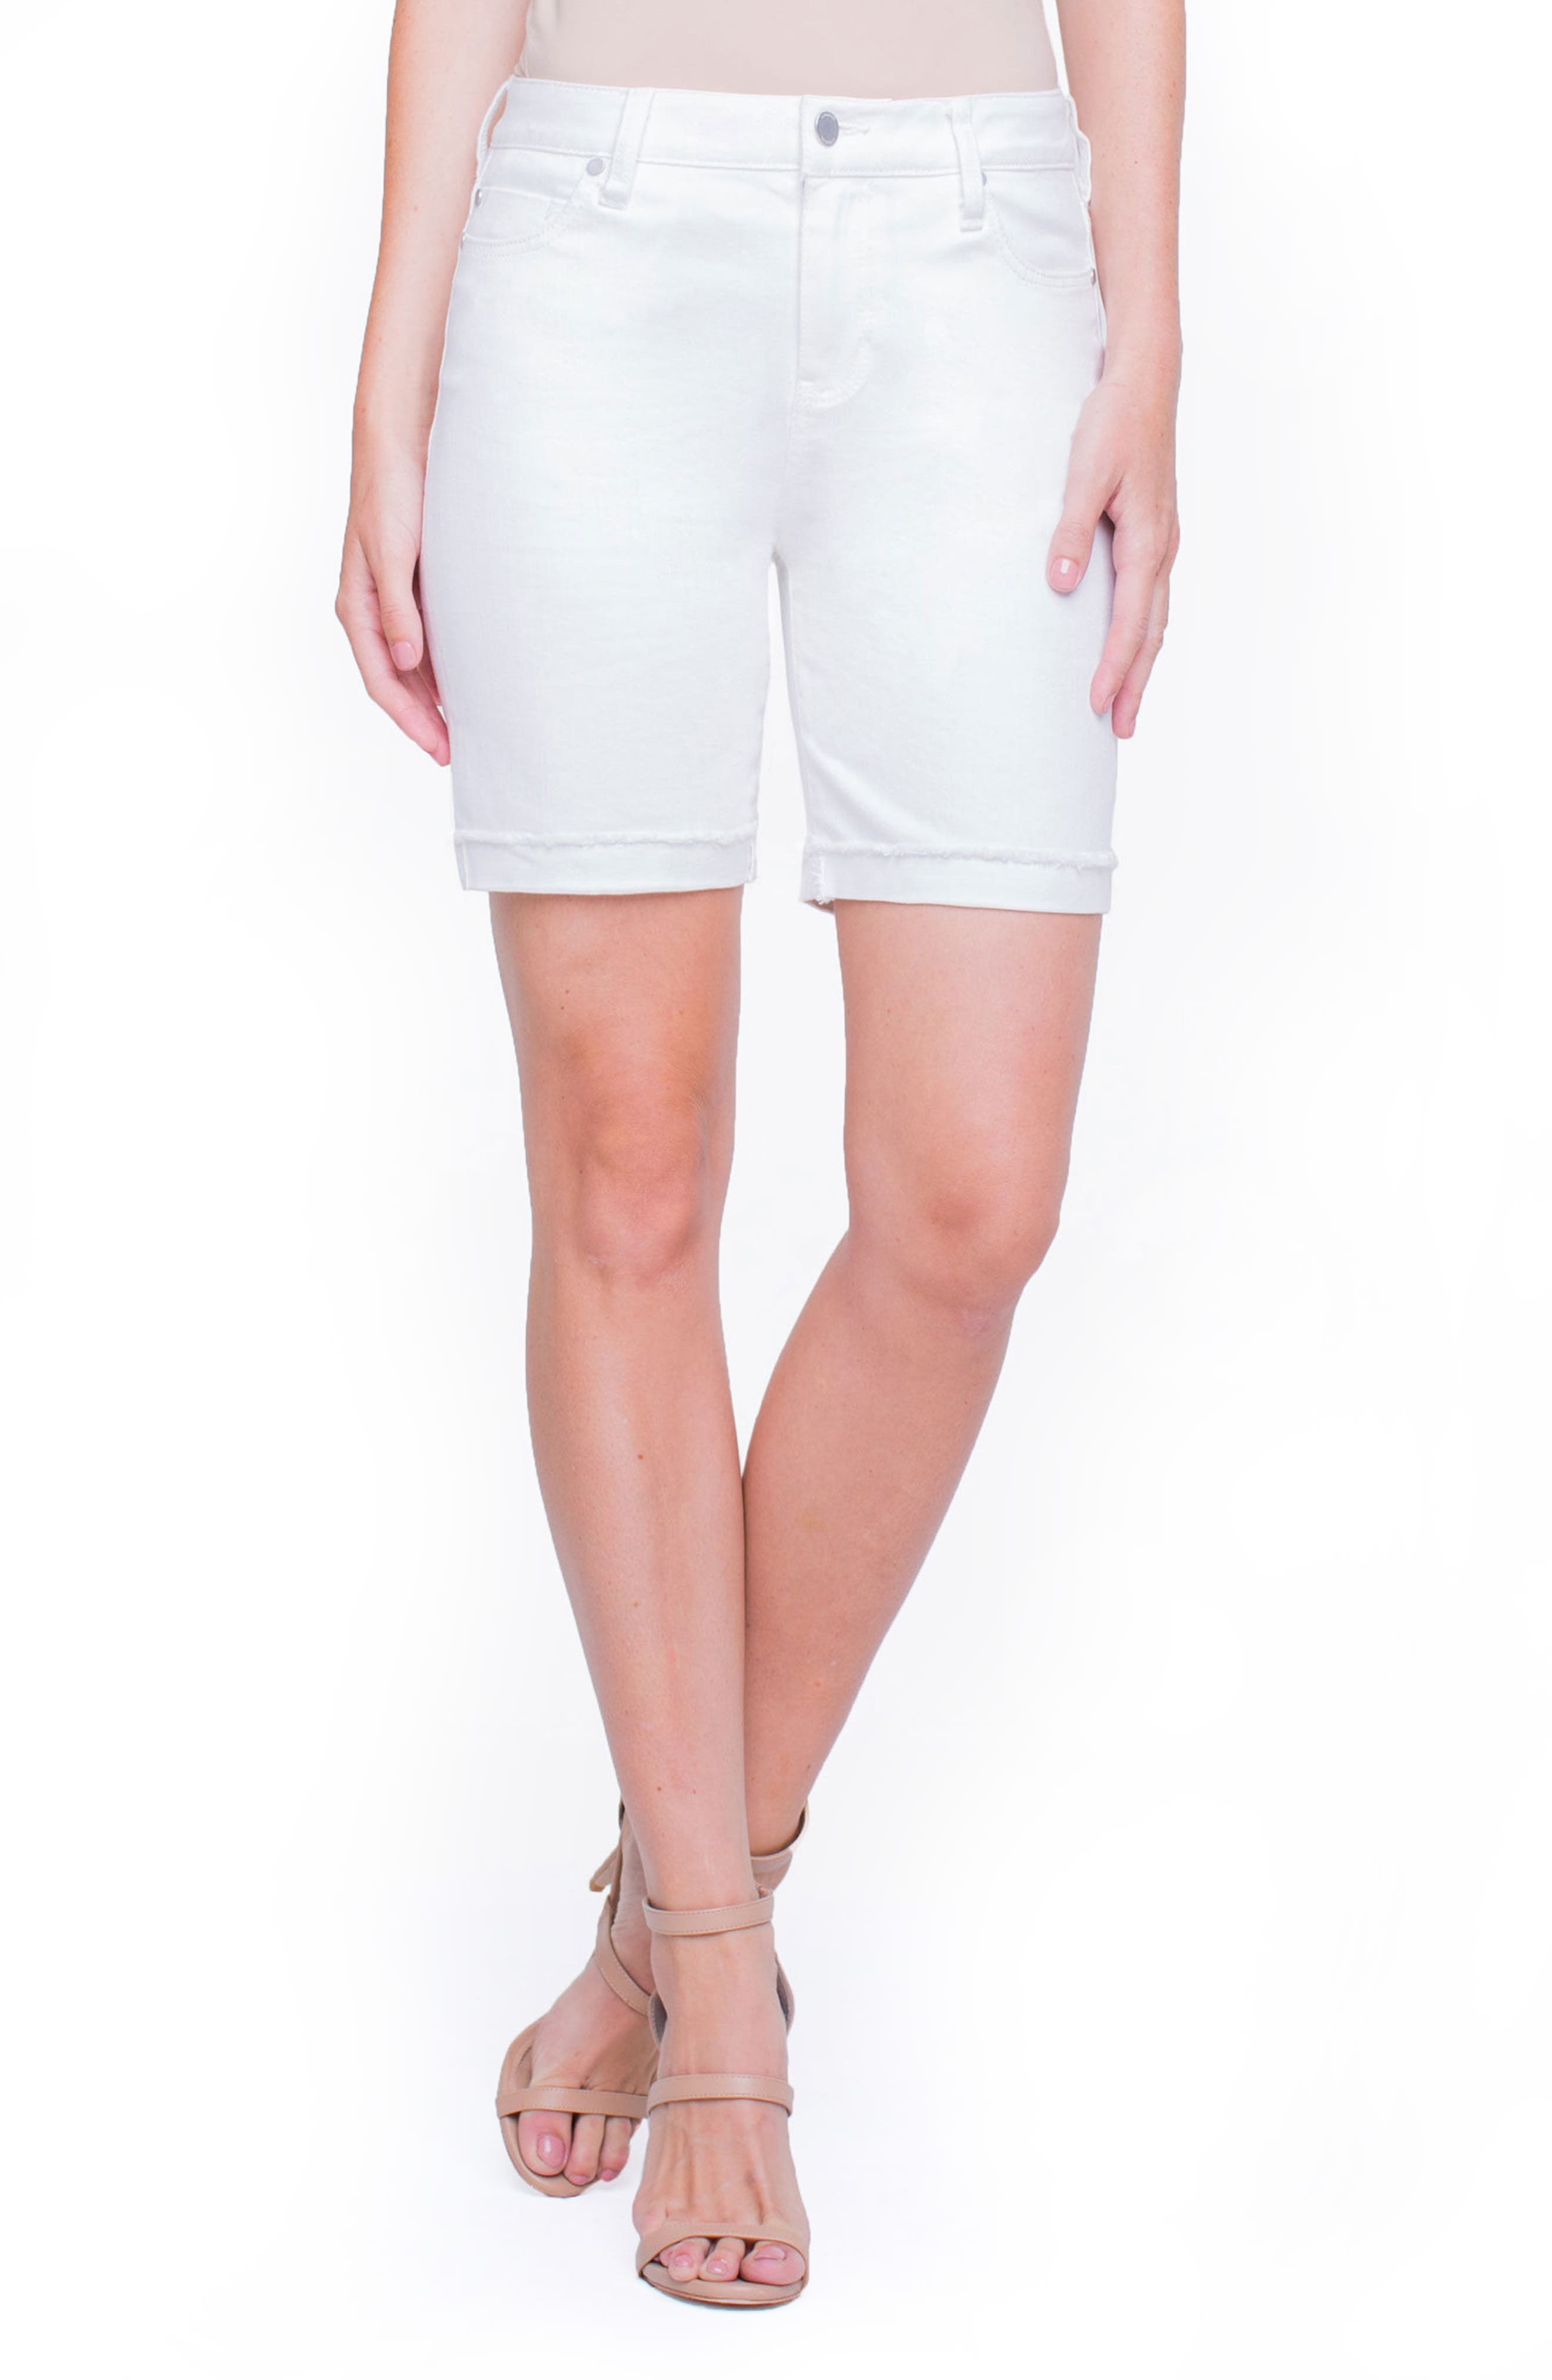 Casey White Denim Shorts,                             Main thumbnail 1, color,                             Bright White